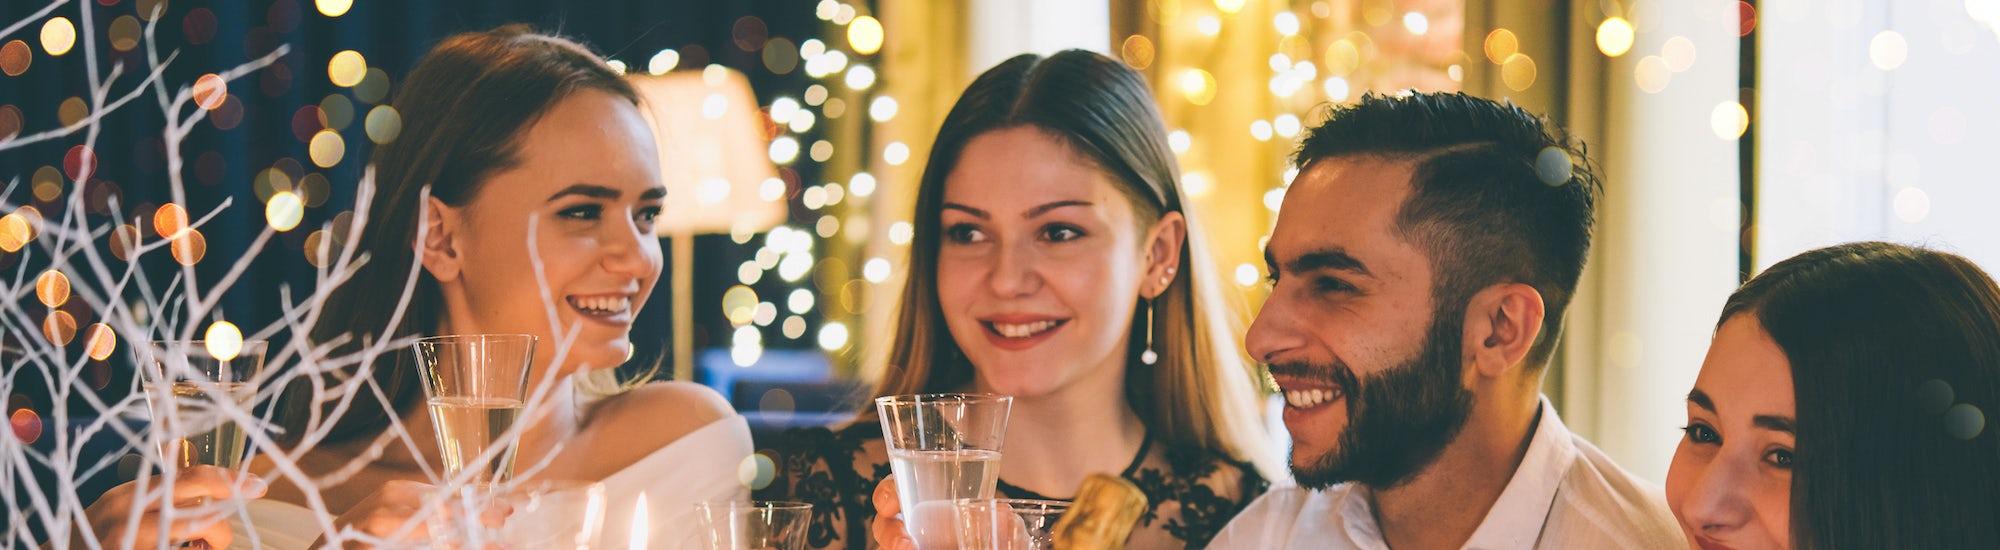 New Year celebration drinks